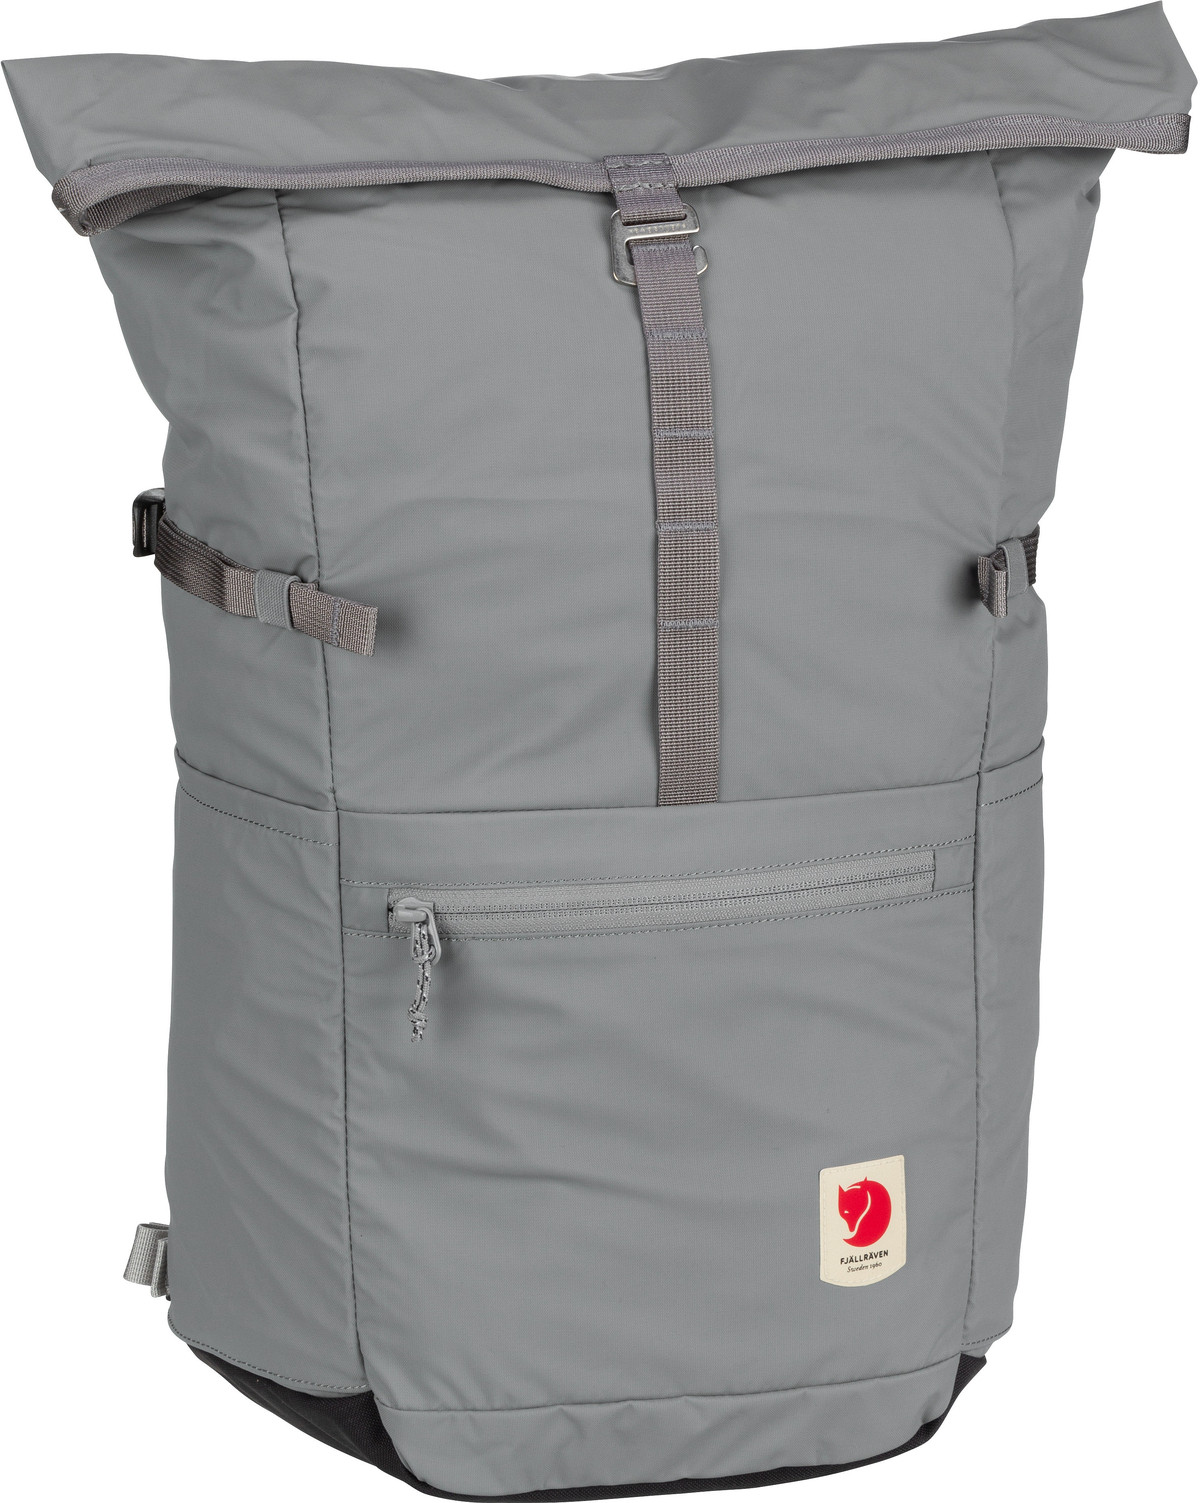 Rucksack / Daypack High Coast Foldsack 24 Shark Grey (24 Liter)